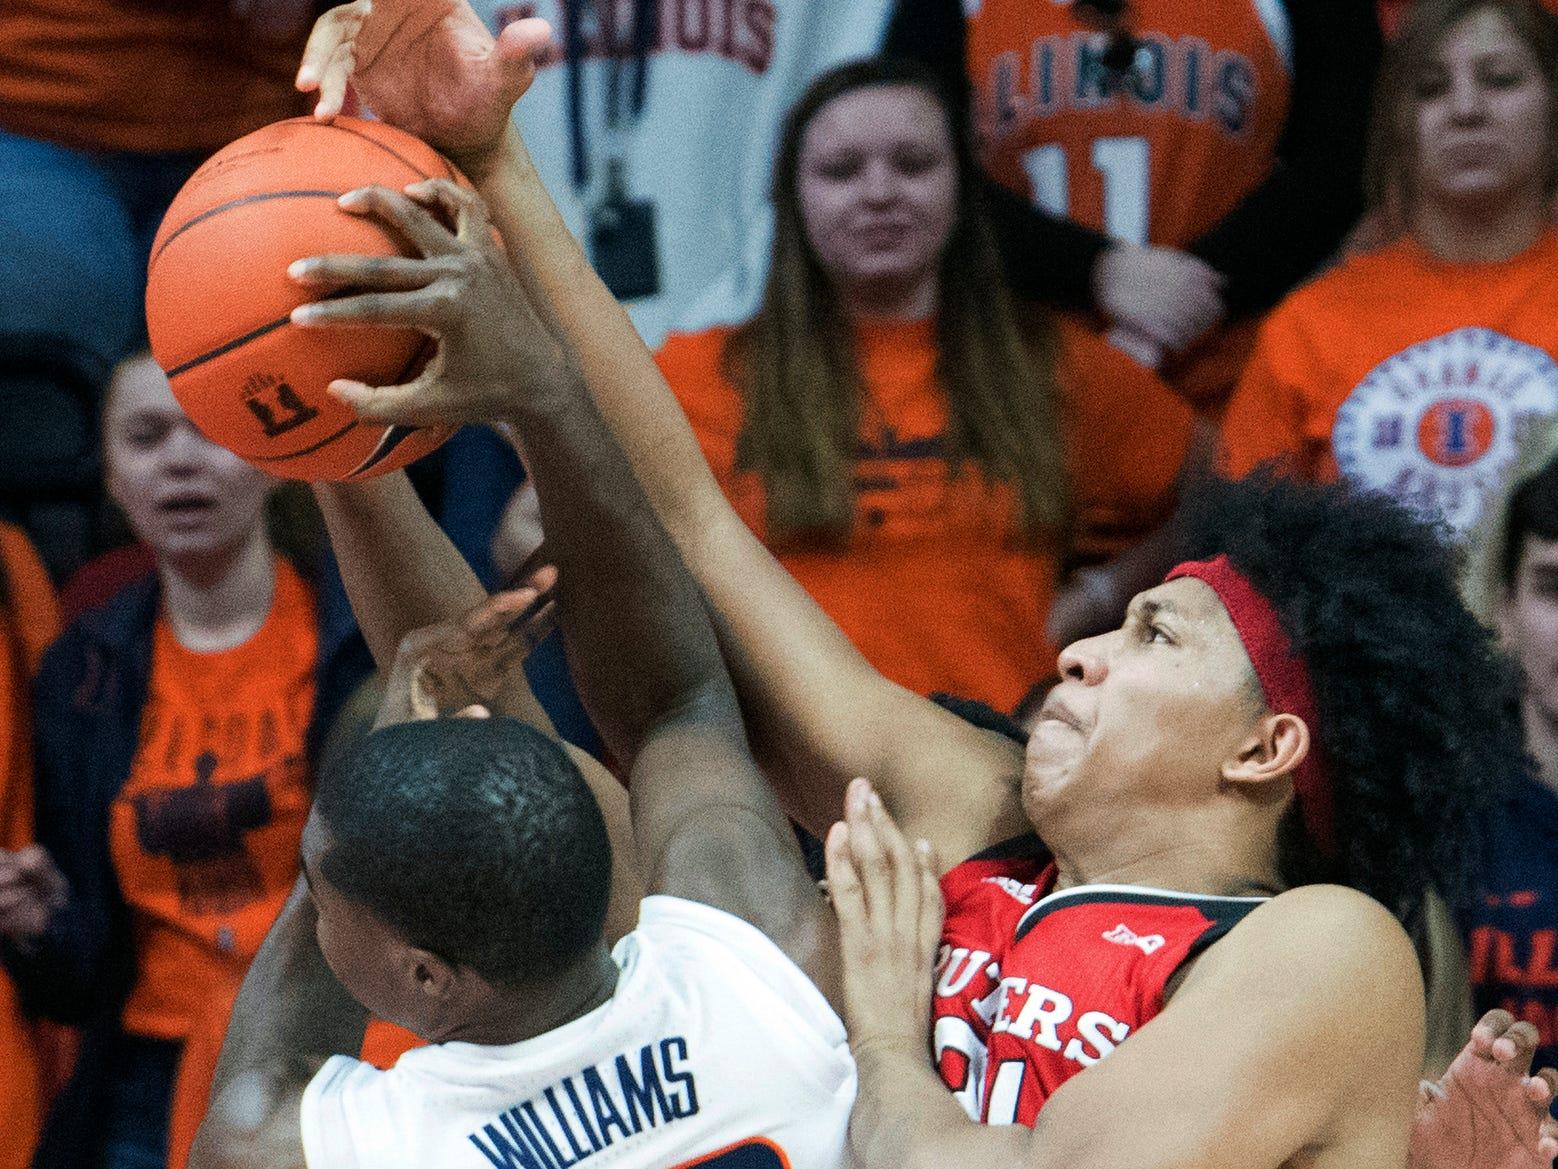 Illinois guard Da'Monte Williams (20) and Rutgers forward Ron Harper Jr. , right, struggle in the second half of an NCAA college basketball game in Champaign, Ill., Saturday, Feb. 9, 2019. (AP Photo/Robin Scholz)